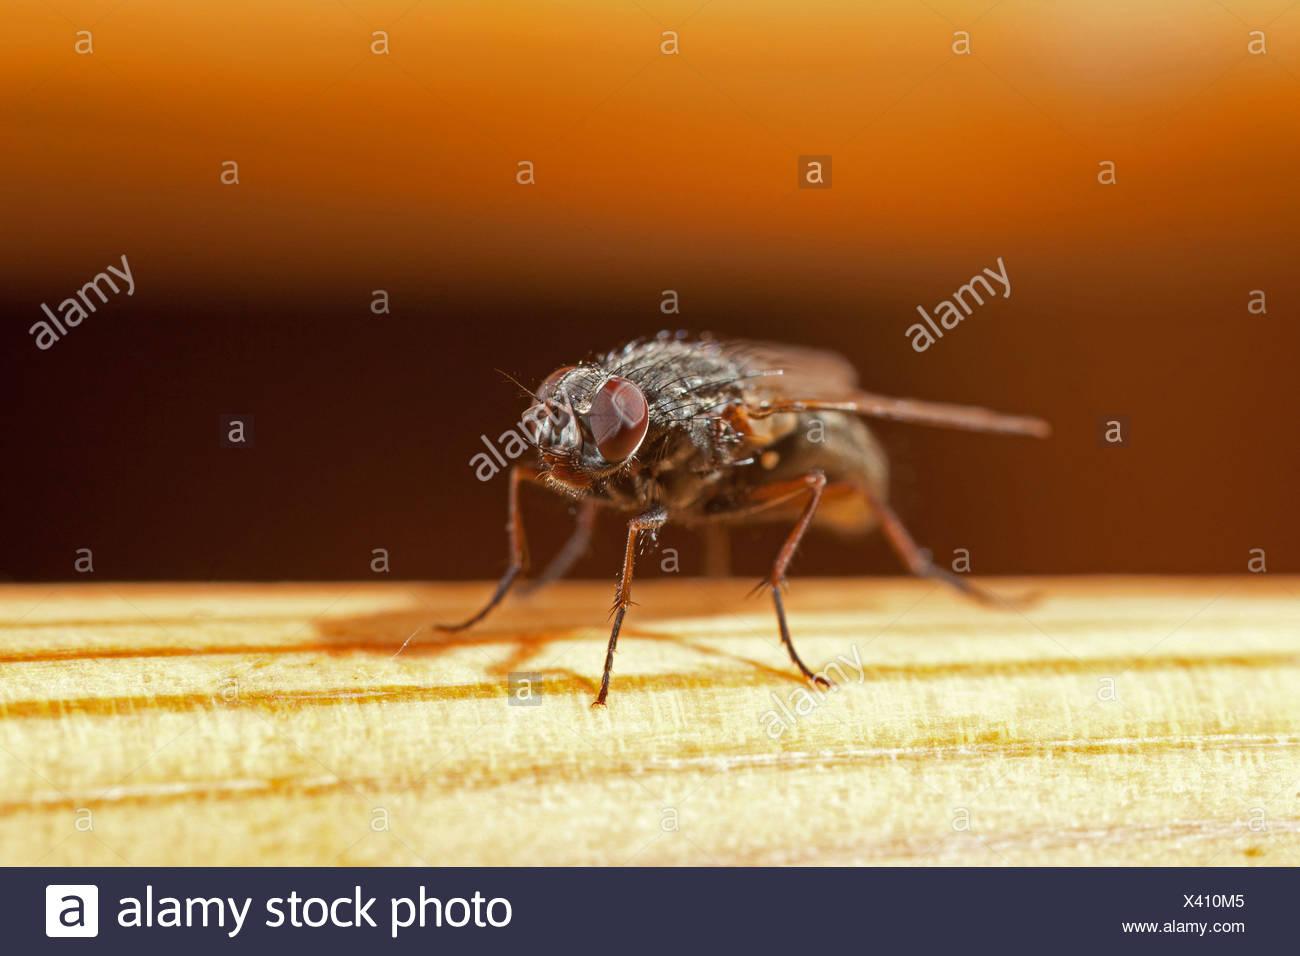 La mosca doméstica menor (Fannia canicularis), macro shot, Alemania, Baviera Imagen De Stock